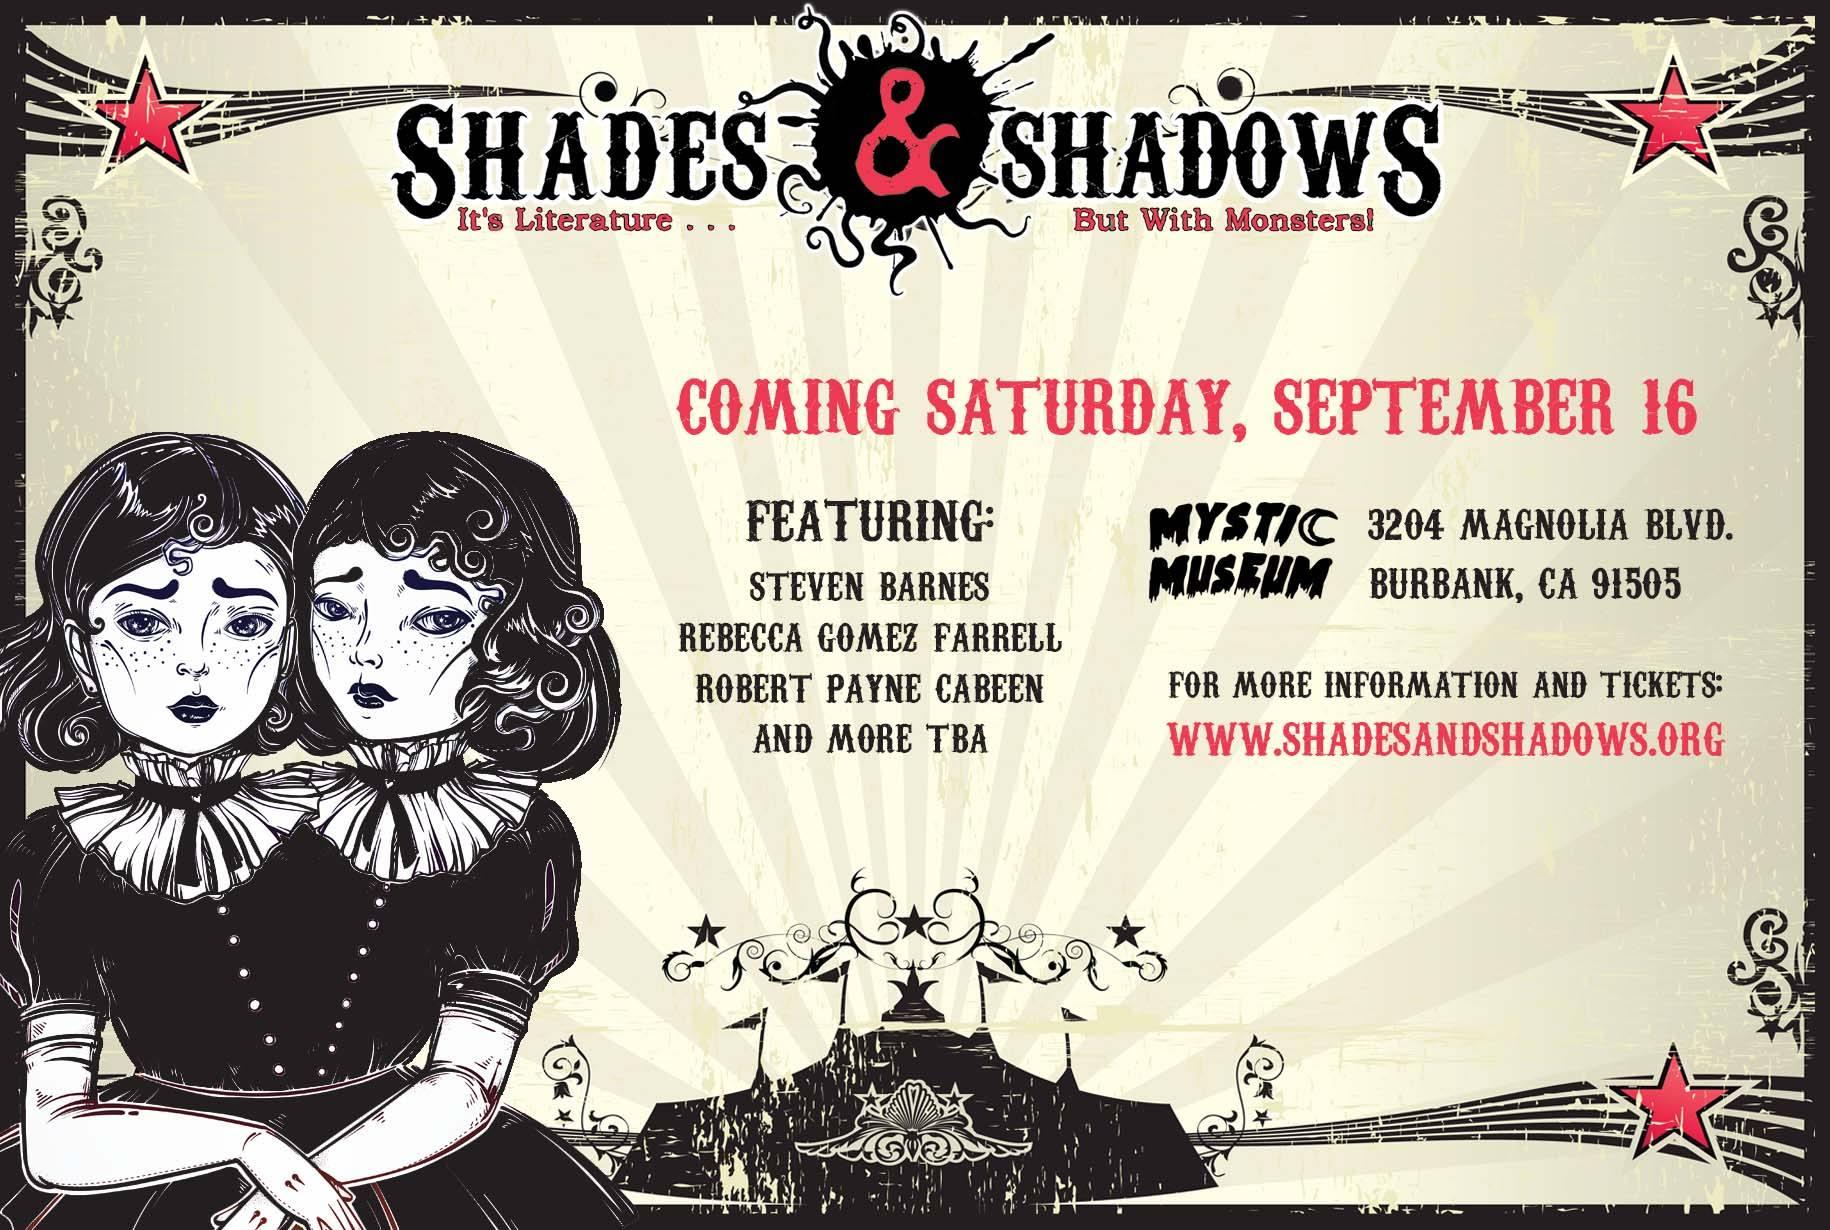 shades and shadows reading rebecca gomez farrell